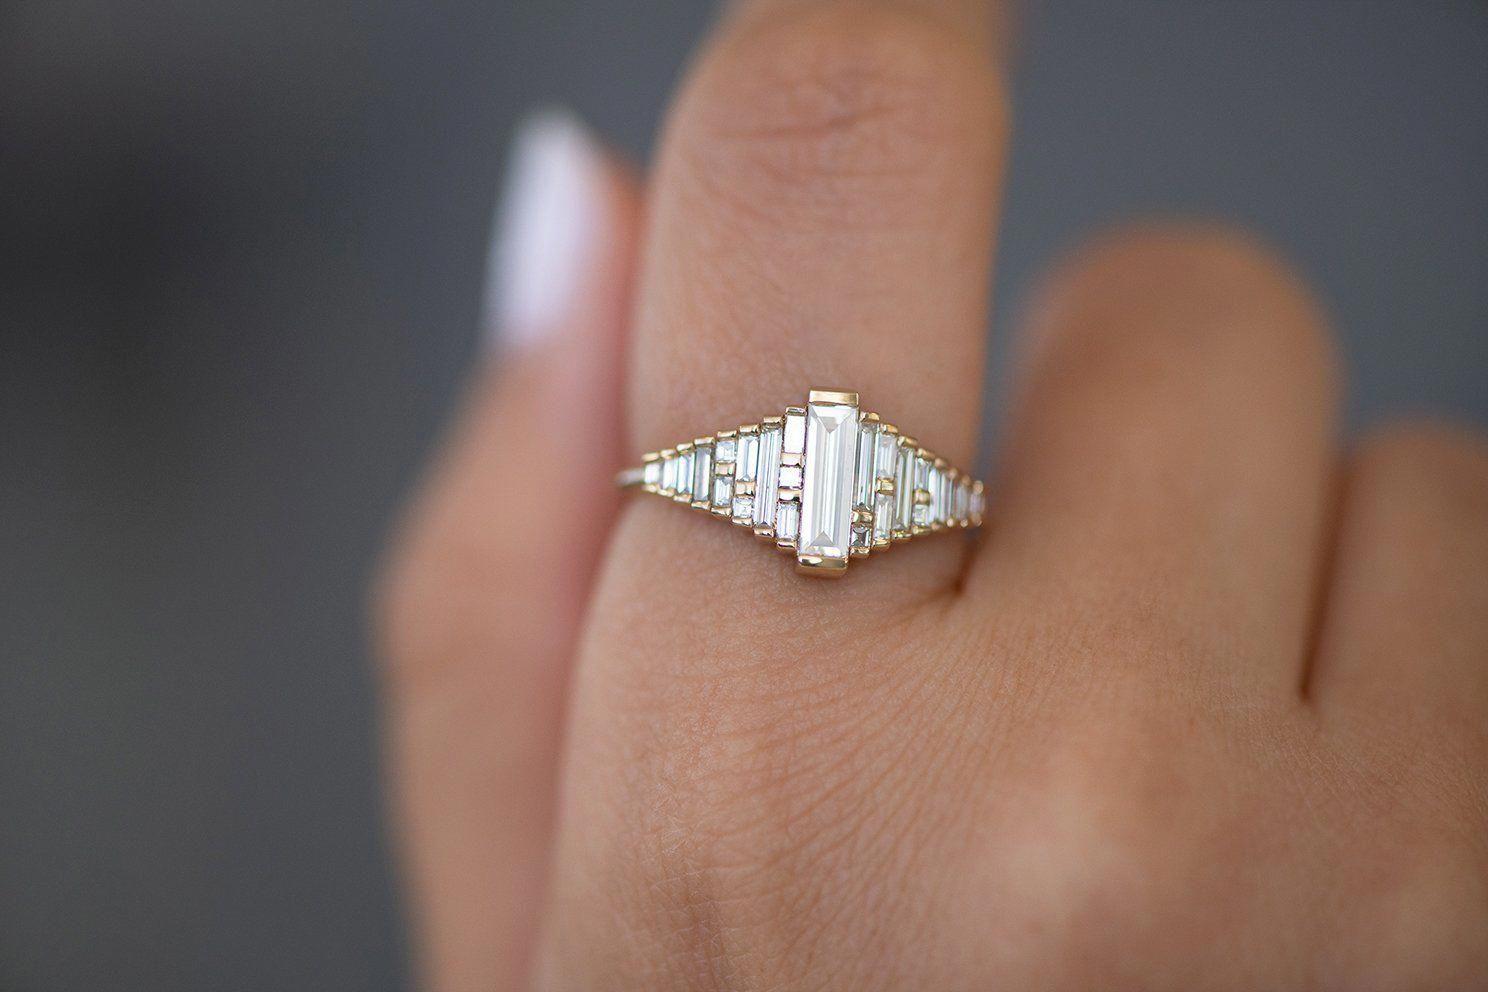 1.2ct Baguette Cut Diamond Engagement Ring 14k Yellow Gold Over Stylish Art Deco